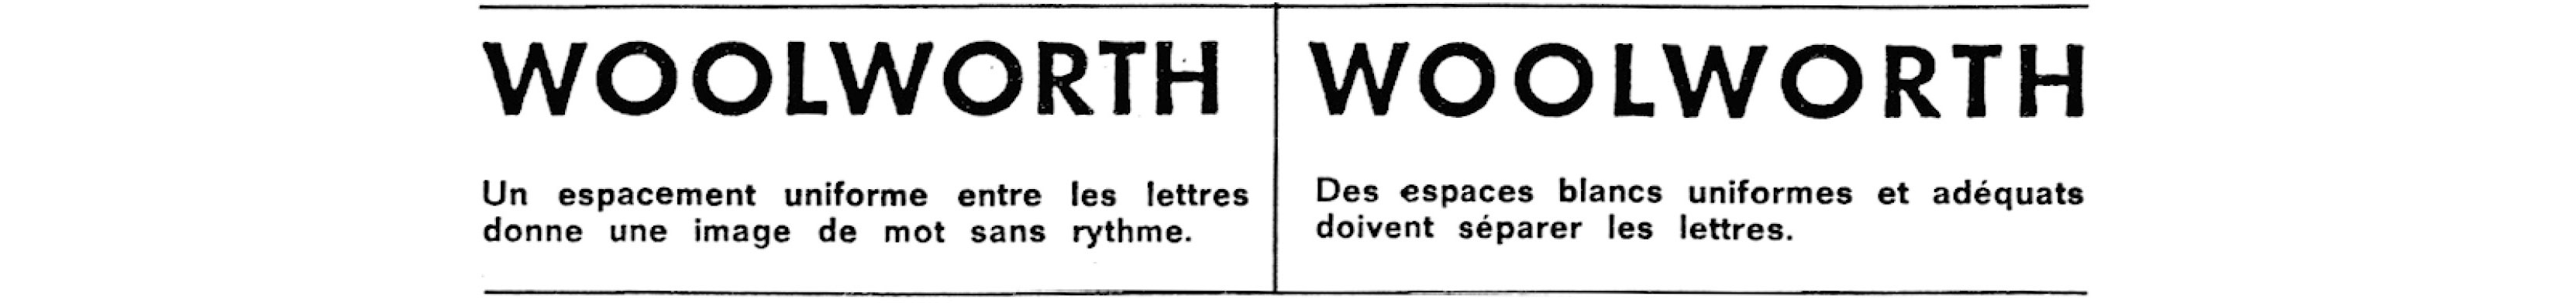 Jan-Tschichold-te-parle-de-typographie-article-Persee-communication-et-langages-1985-schema-02